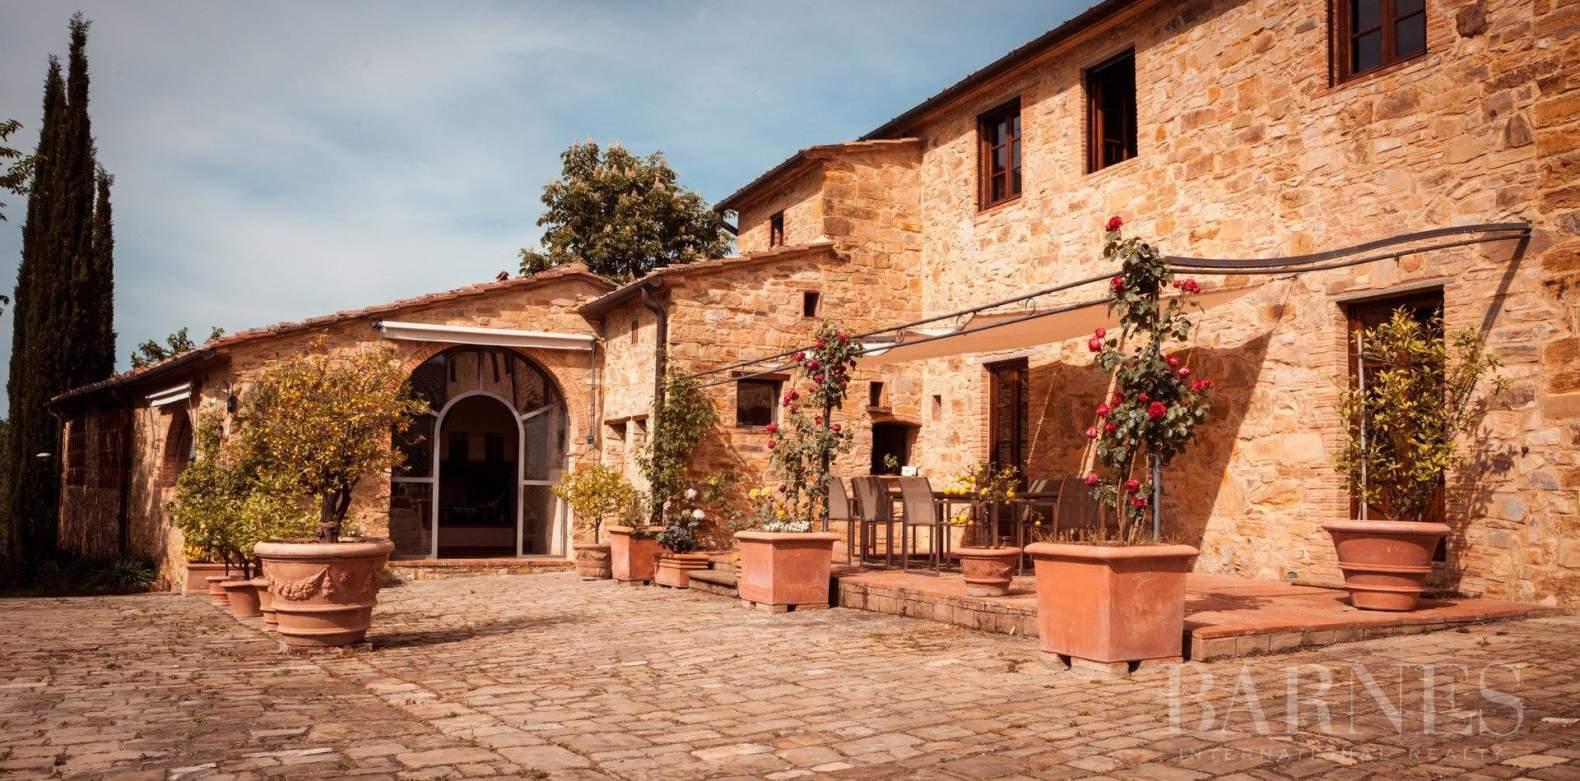 Barberino Tavarnelle  - Villa 10 Cuartos 9 Habitaciones - picture 3